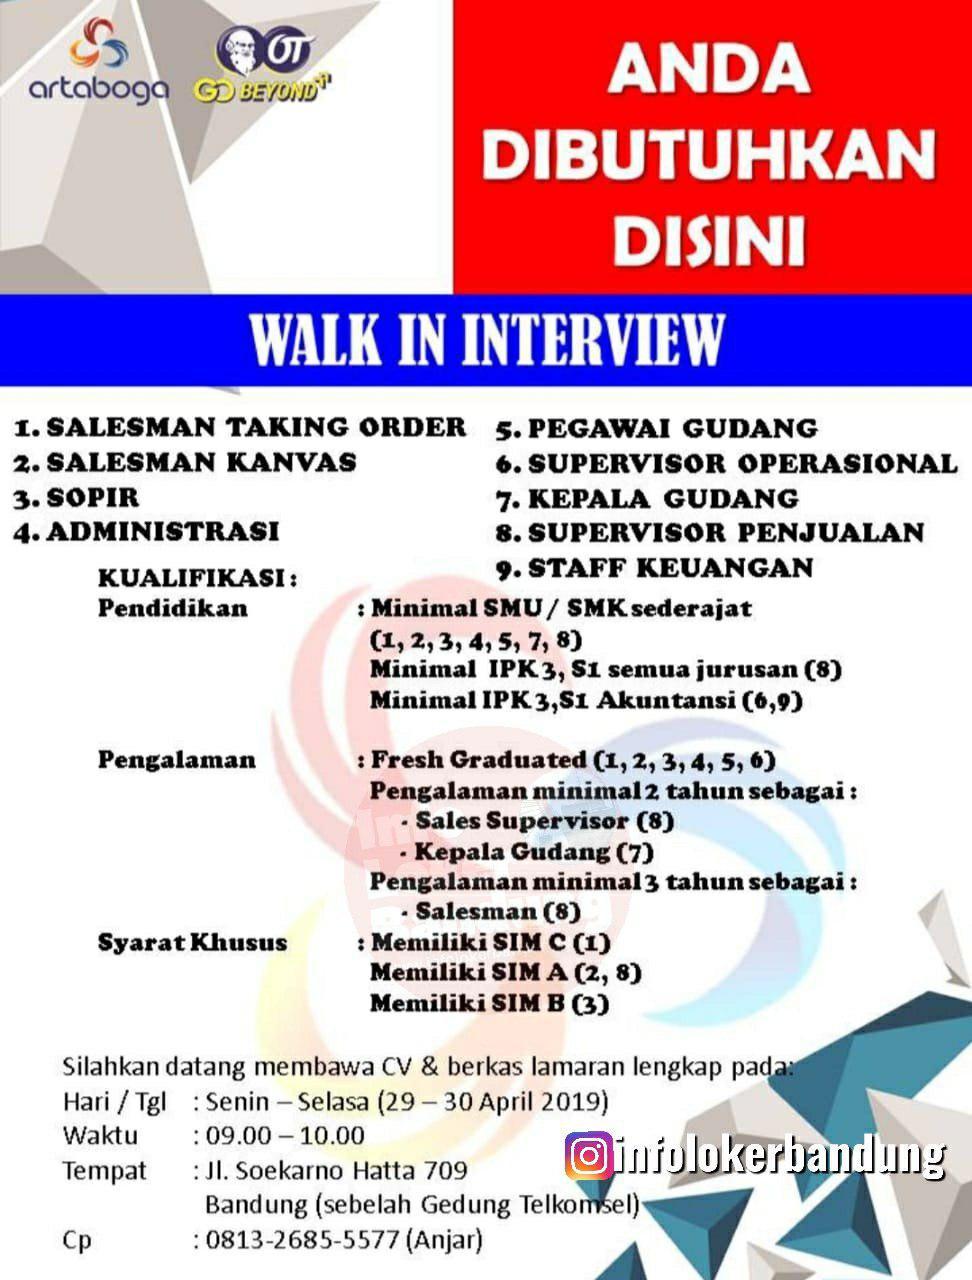 Walk In Interview PT. Artaboga ( Orang Tua Group) Senin-Selasa 29 - 30 April 2019